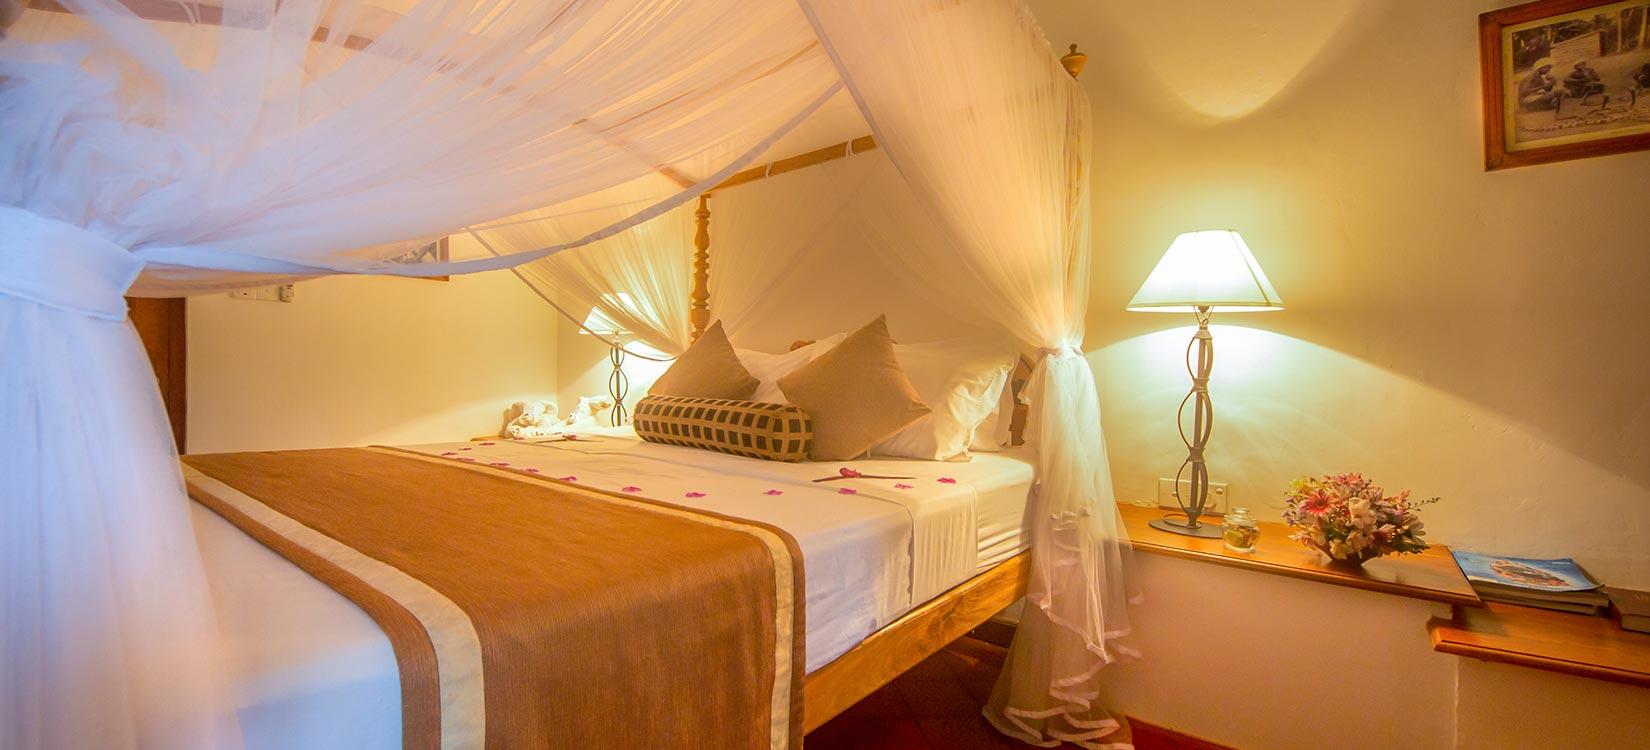 Dikwella Spa standard room